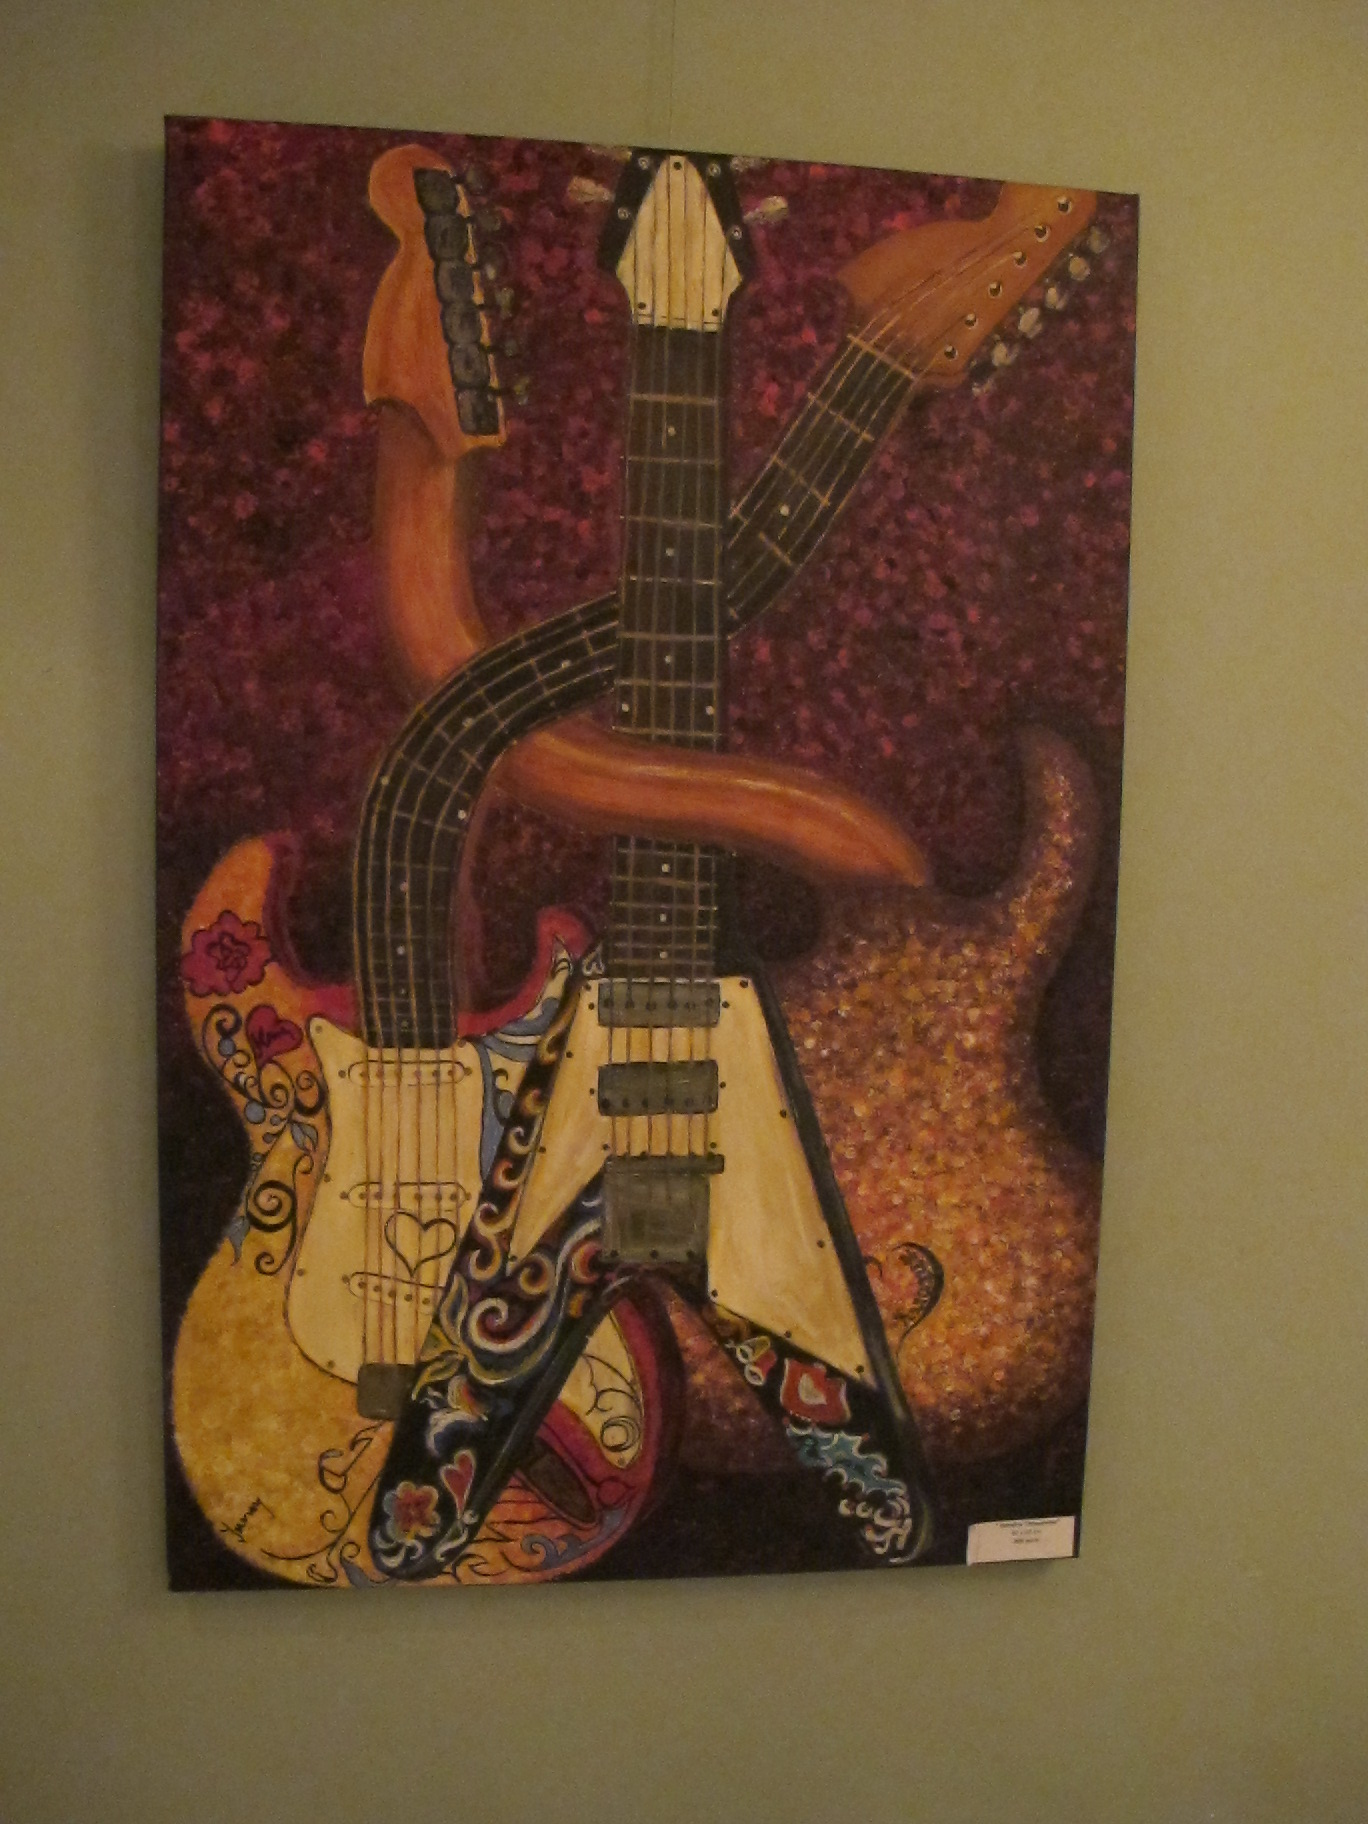 Hendrix Threesome, 90 x 60 cm, 200 euro, Artist Orly Yanay